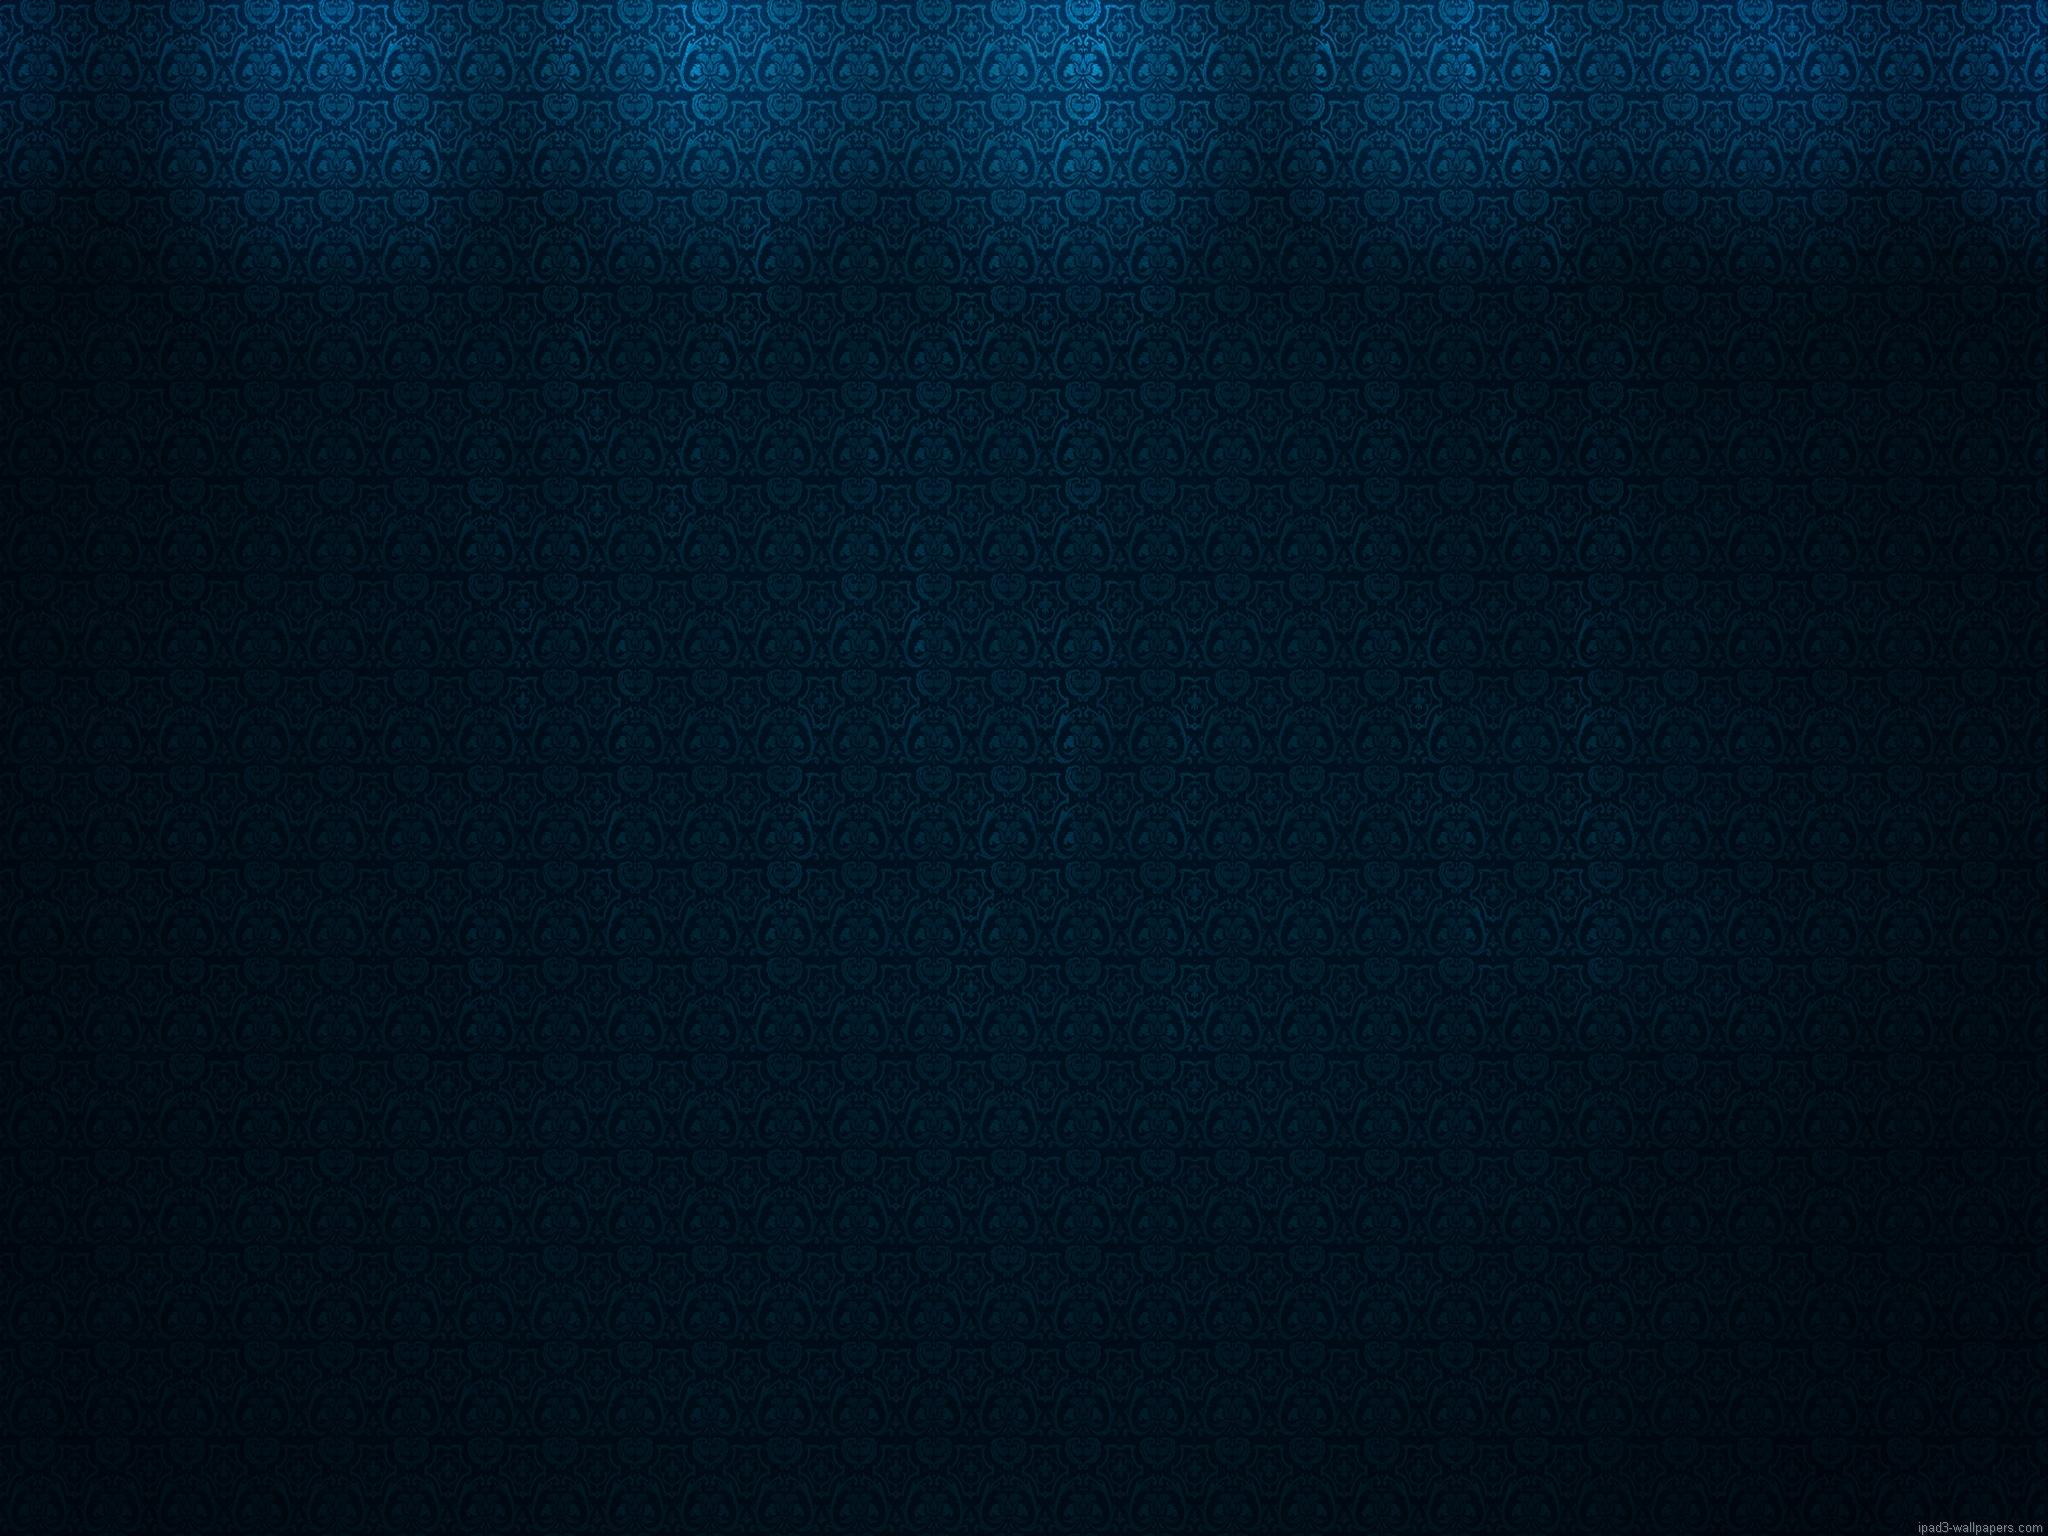 Best iPad 3 Wallpaper 1000 New iPad 3 Background 2048x1536 Photos 2048x1536